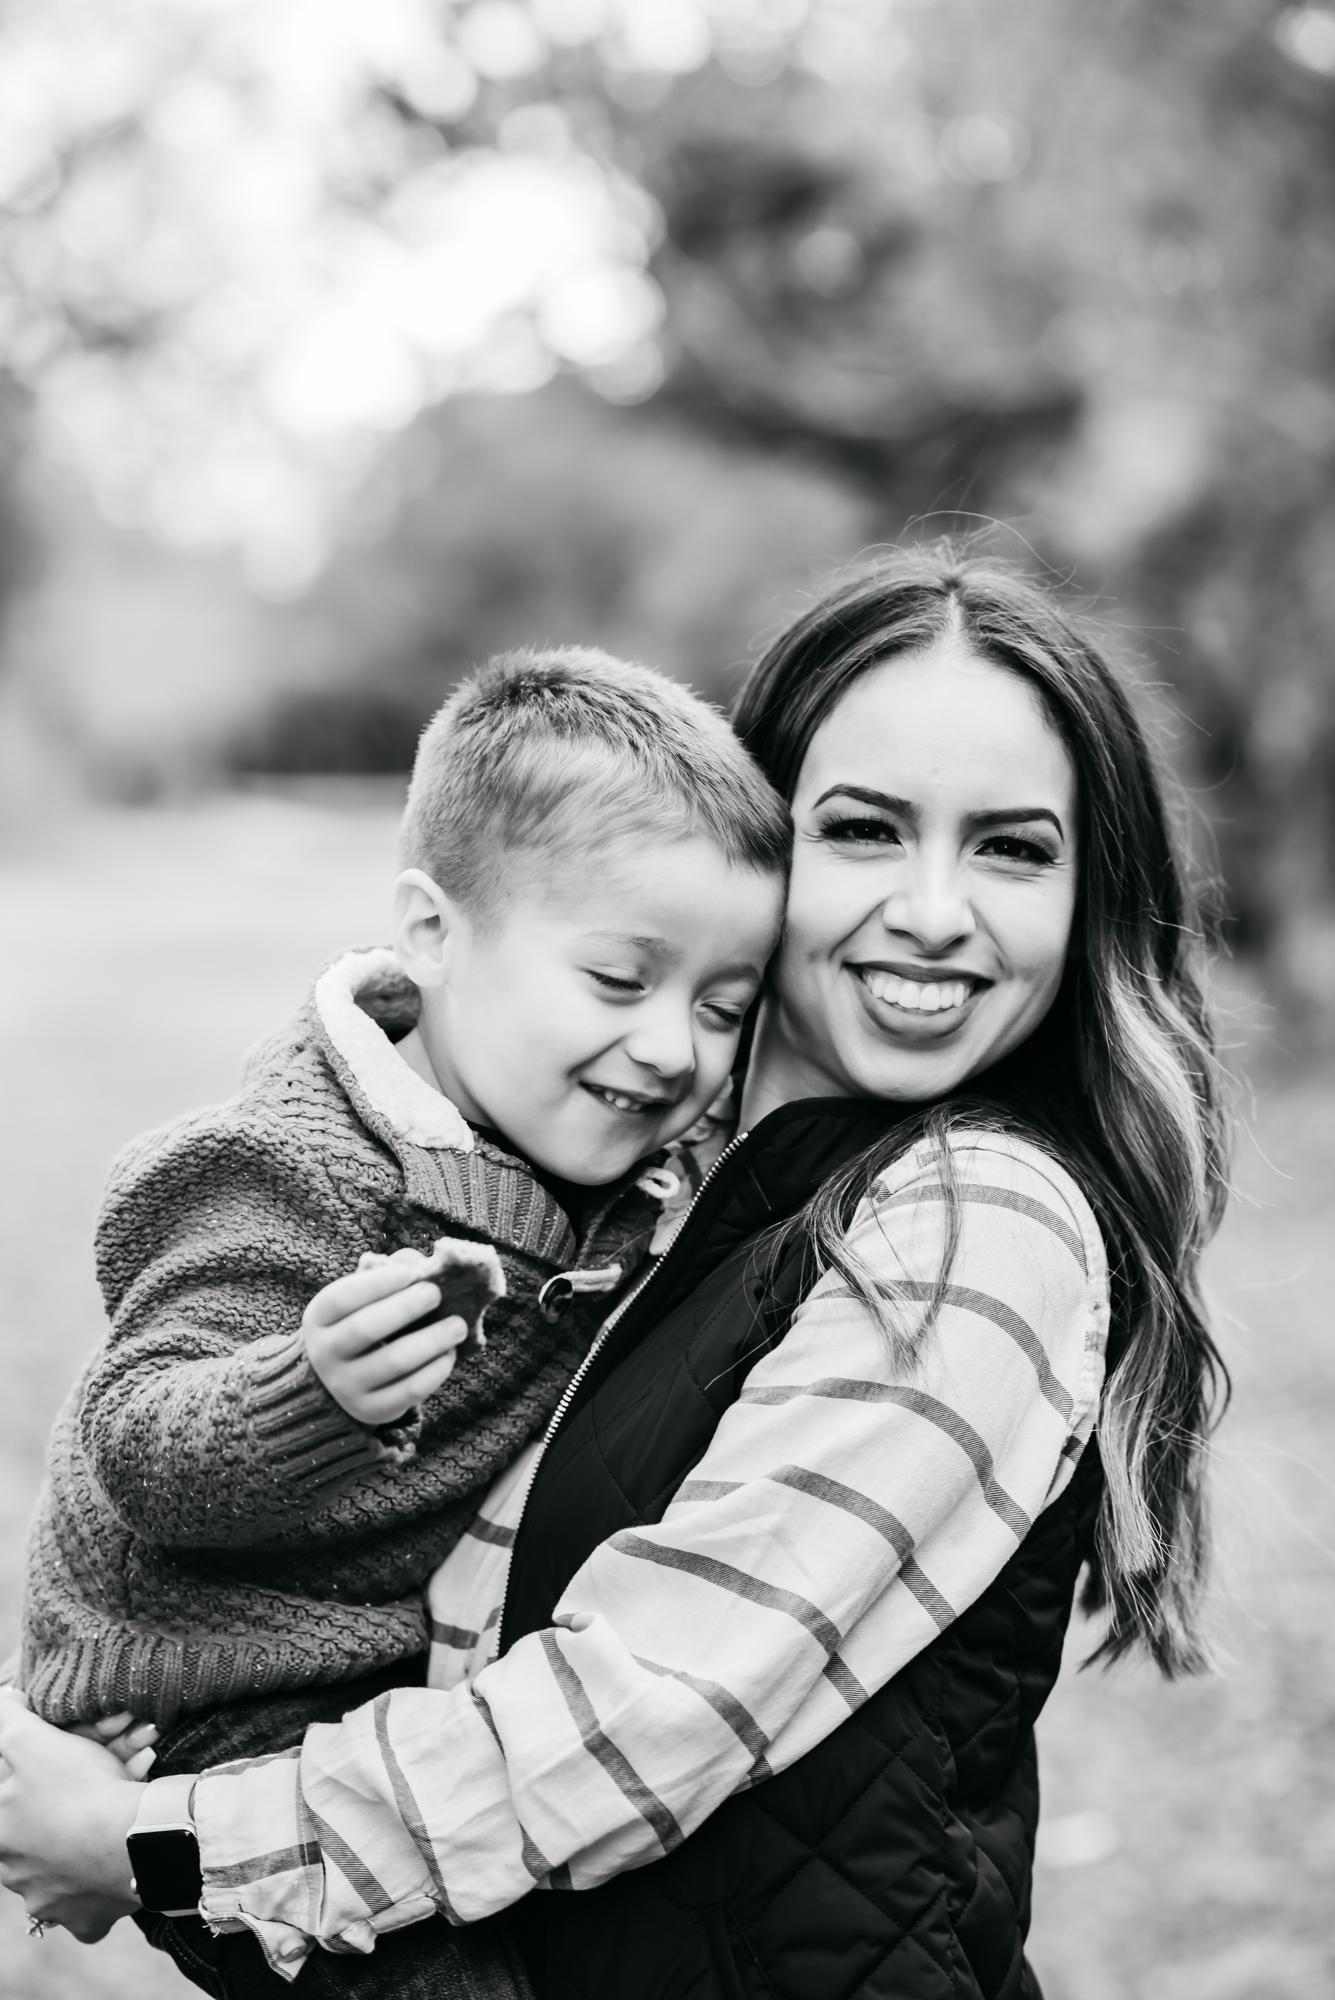 family - maternity, babies, milestones